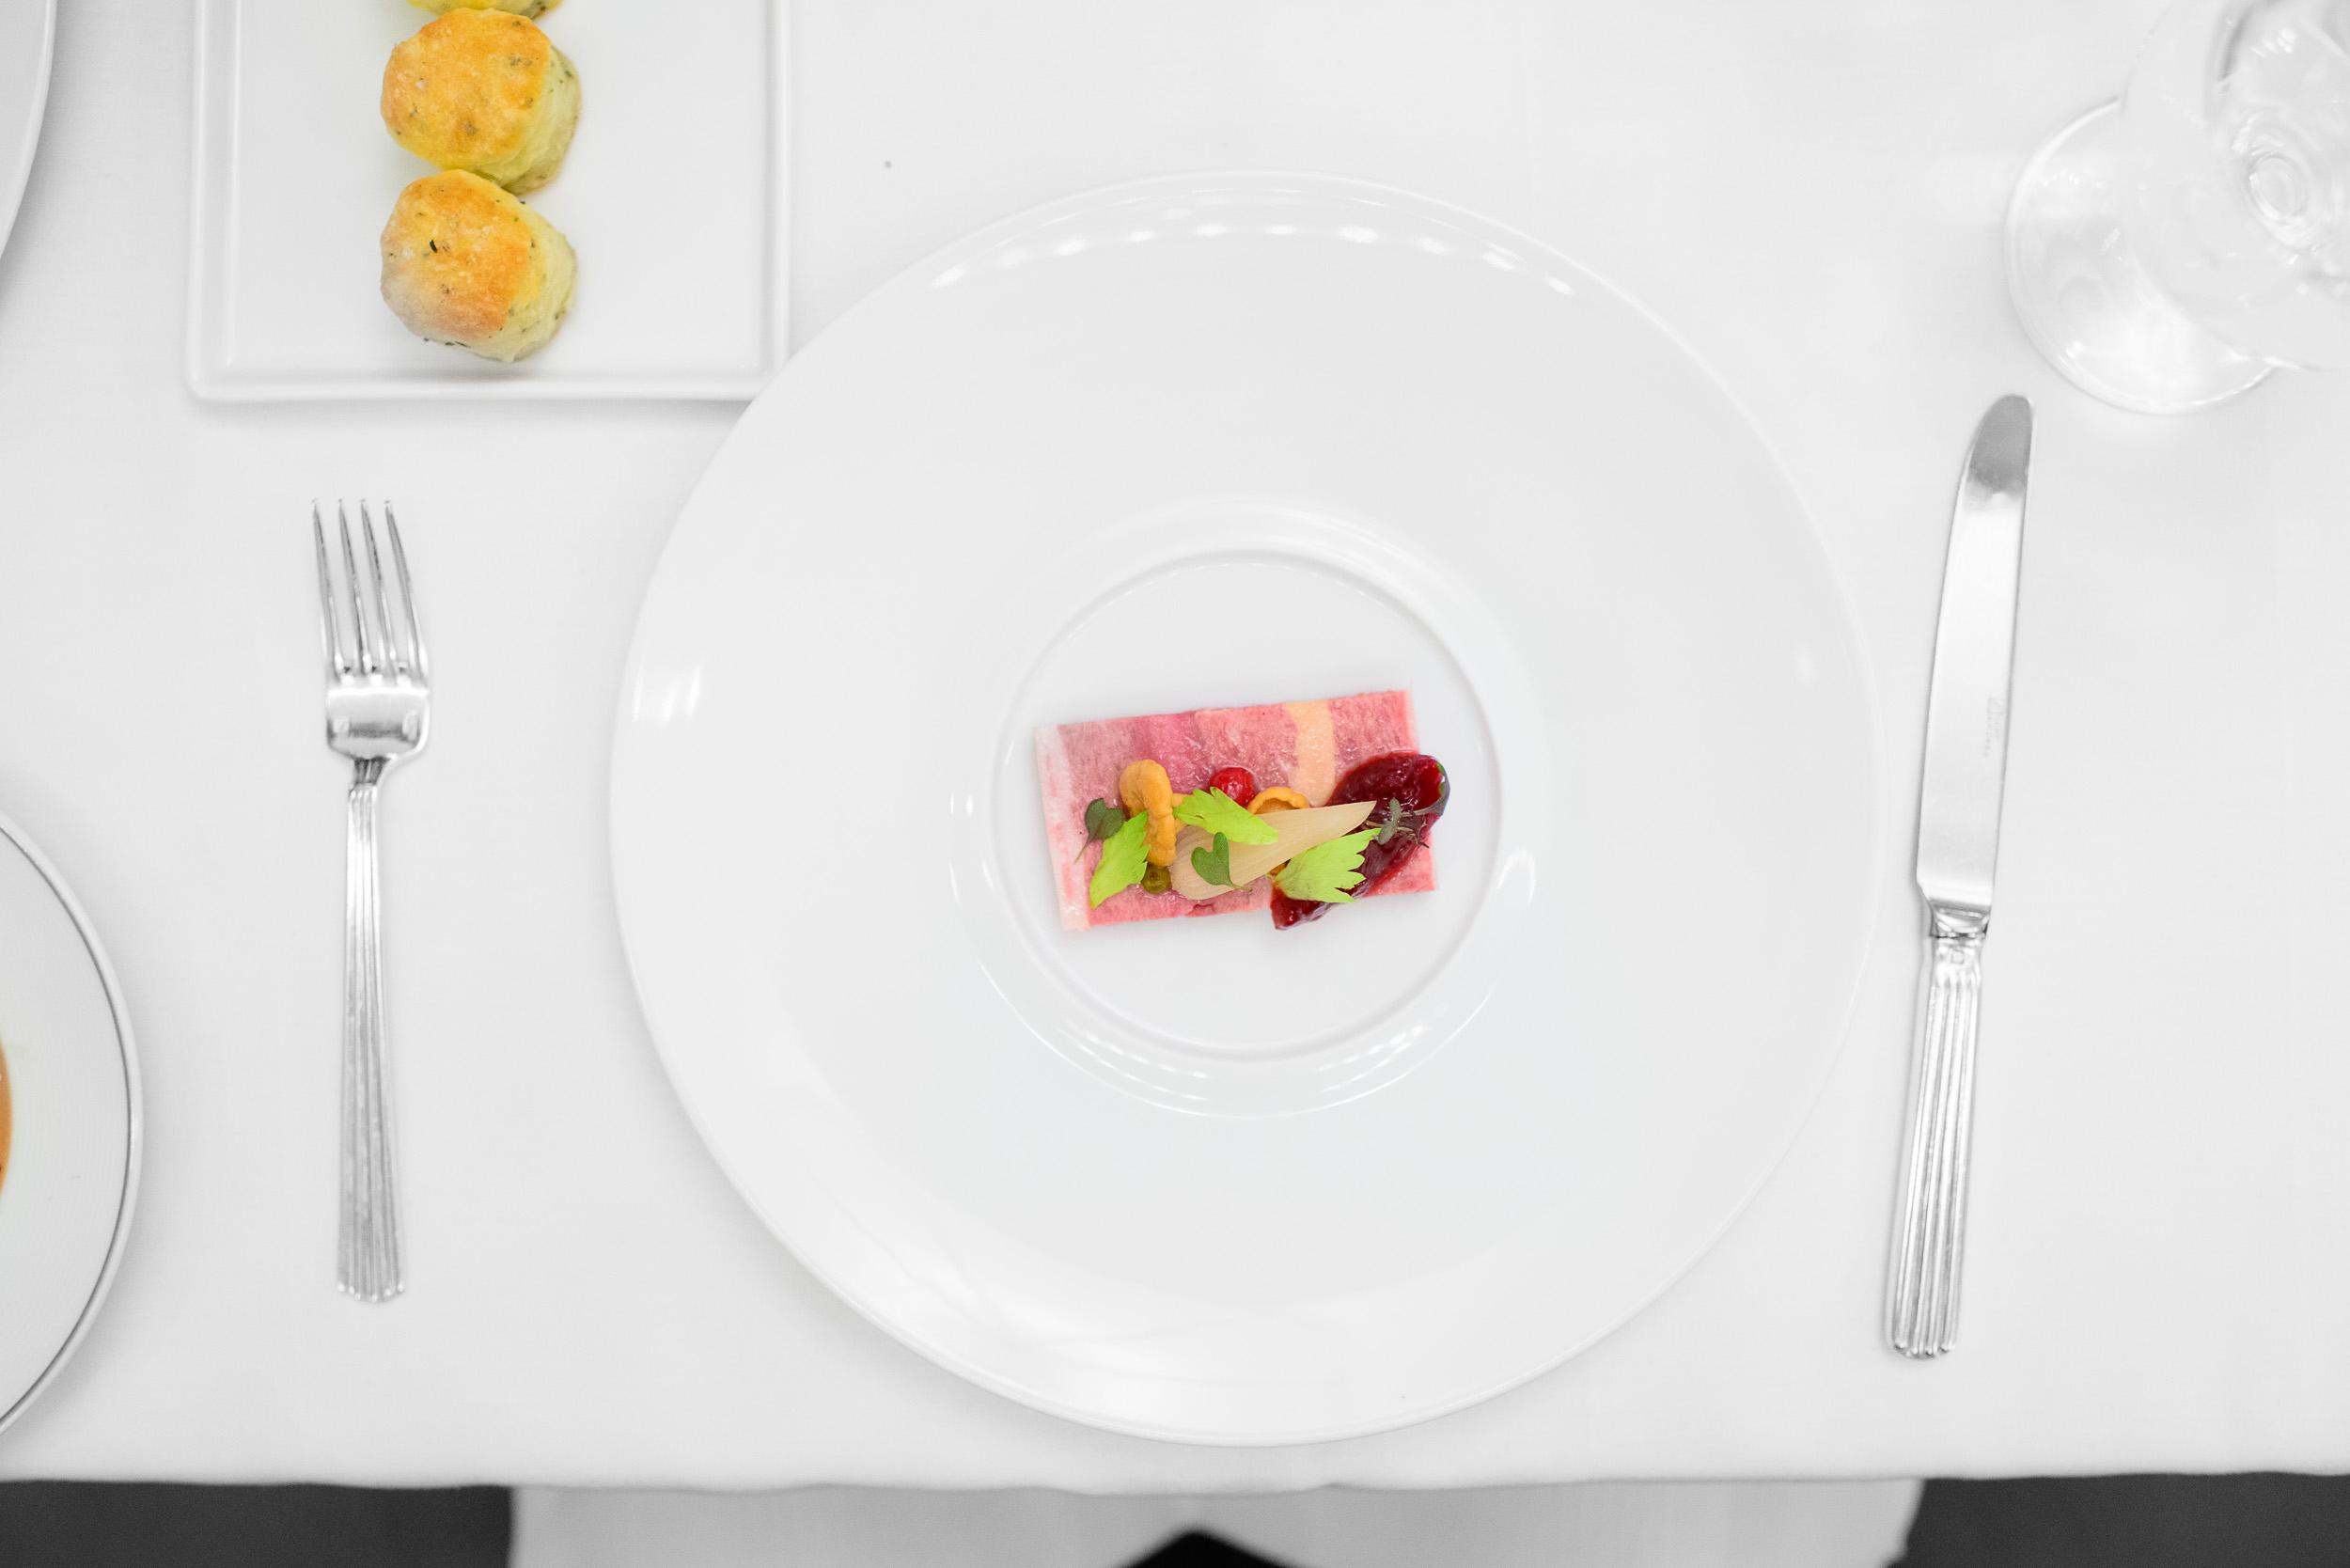 Venison terrine - lingonberry compote, pickled vegetables, rosem